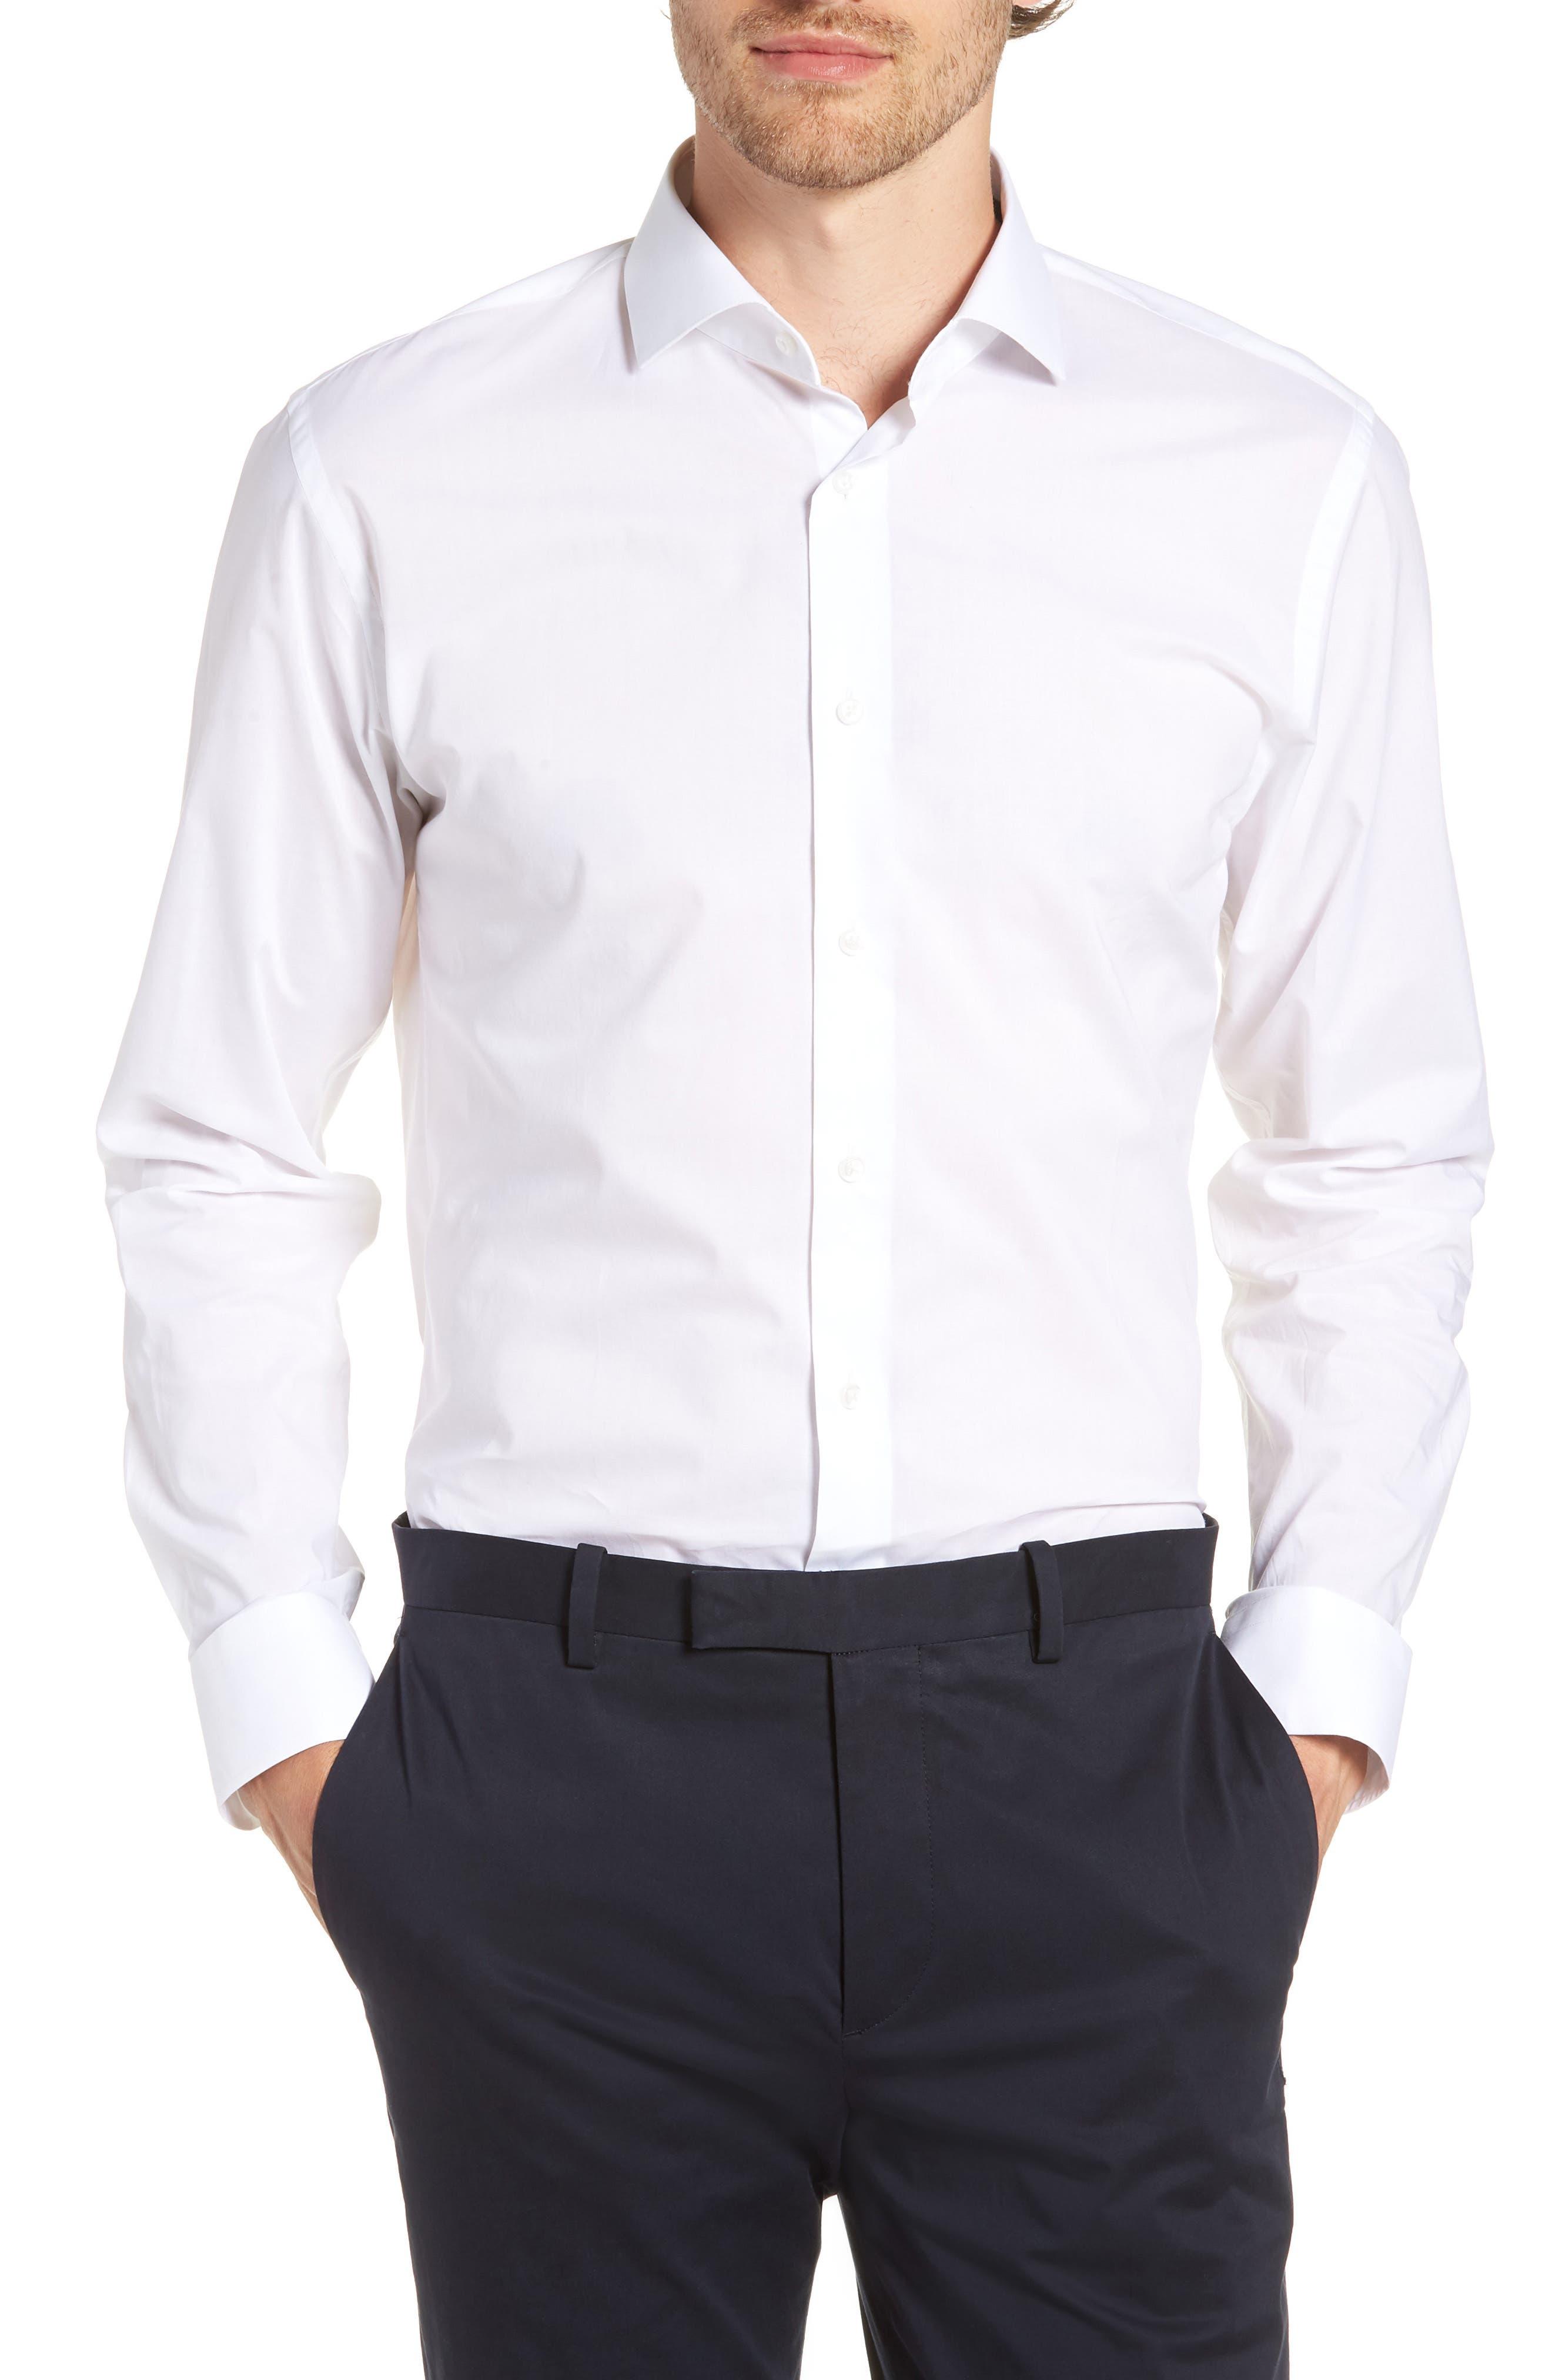 1901 Trim Fit Solid Dress Shirt, Main, color, WHITE